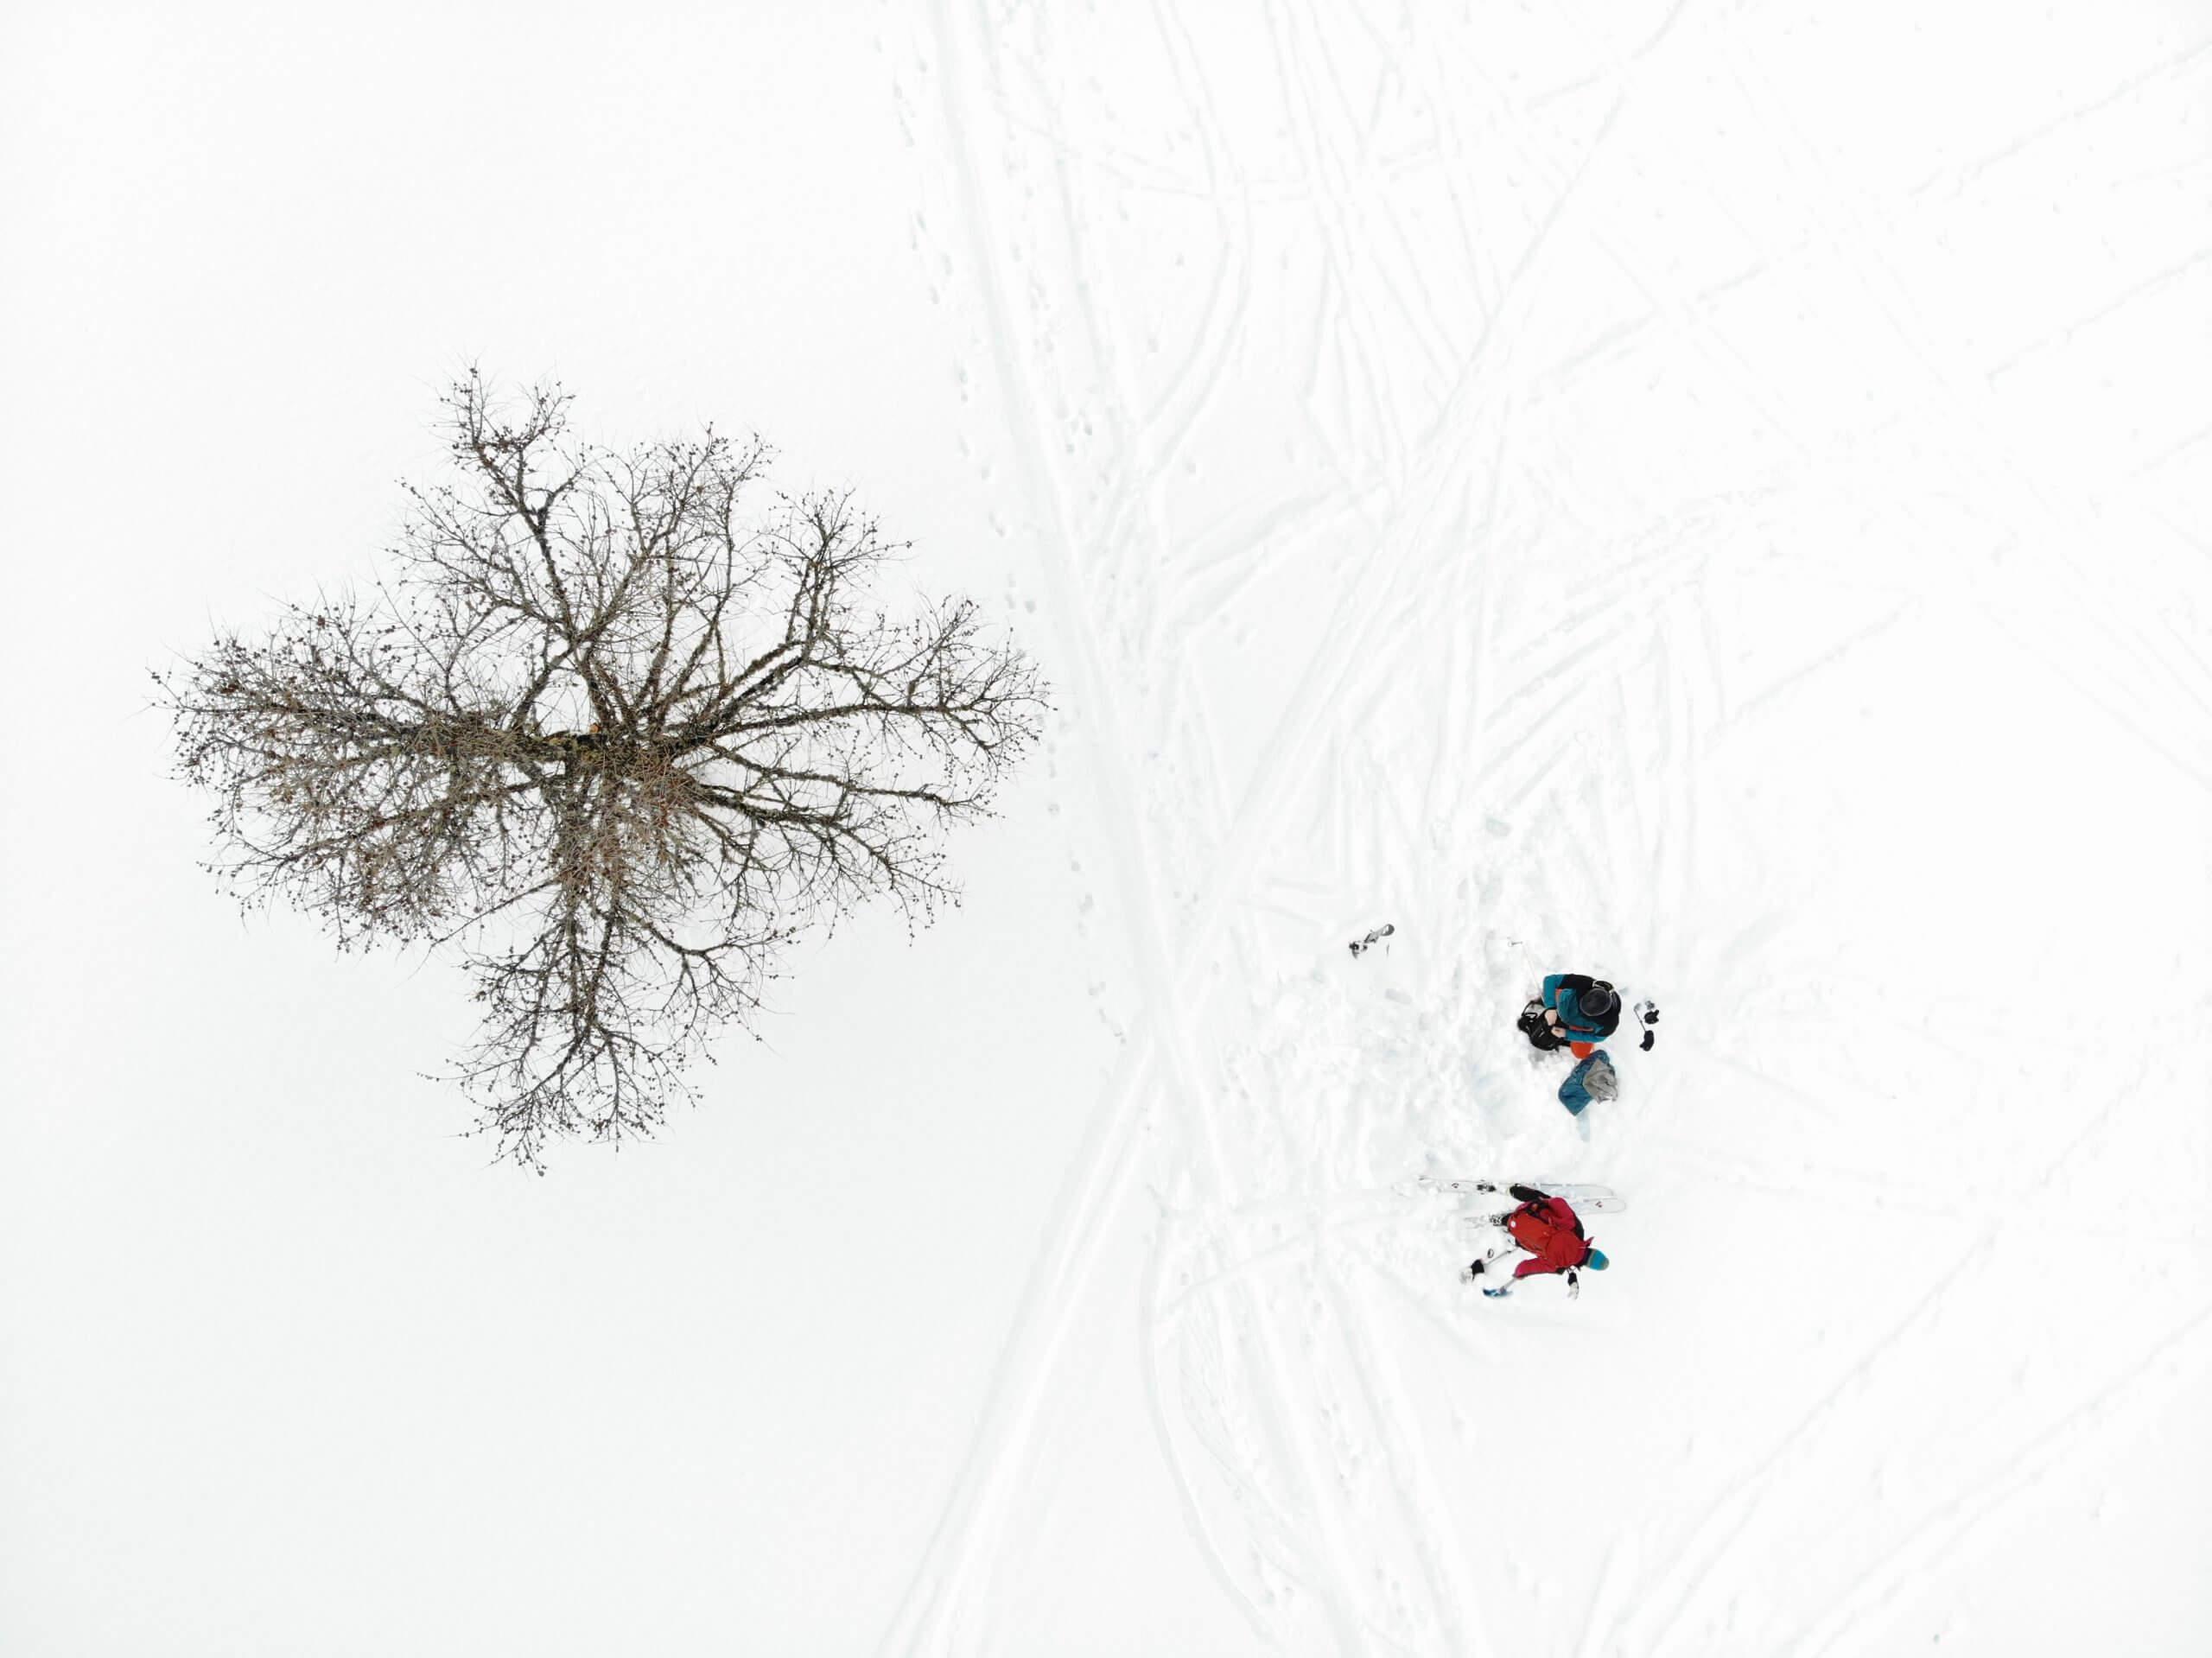 SEO alpinonline, pic by argonautpro